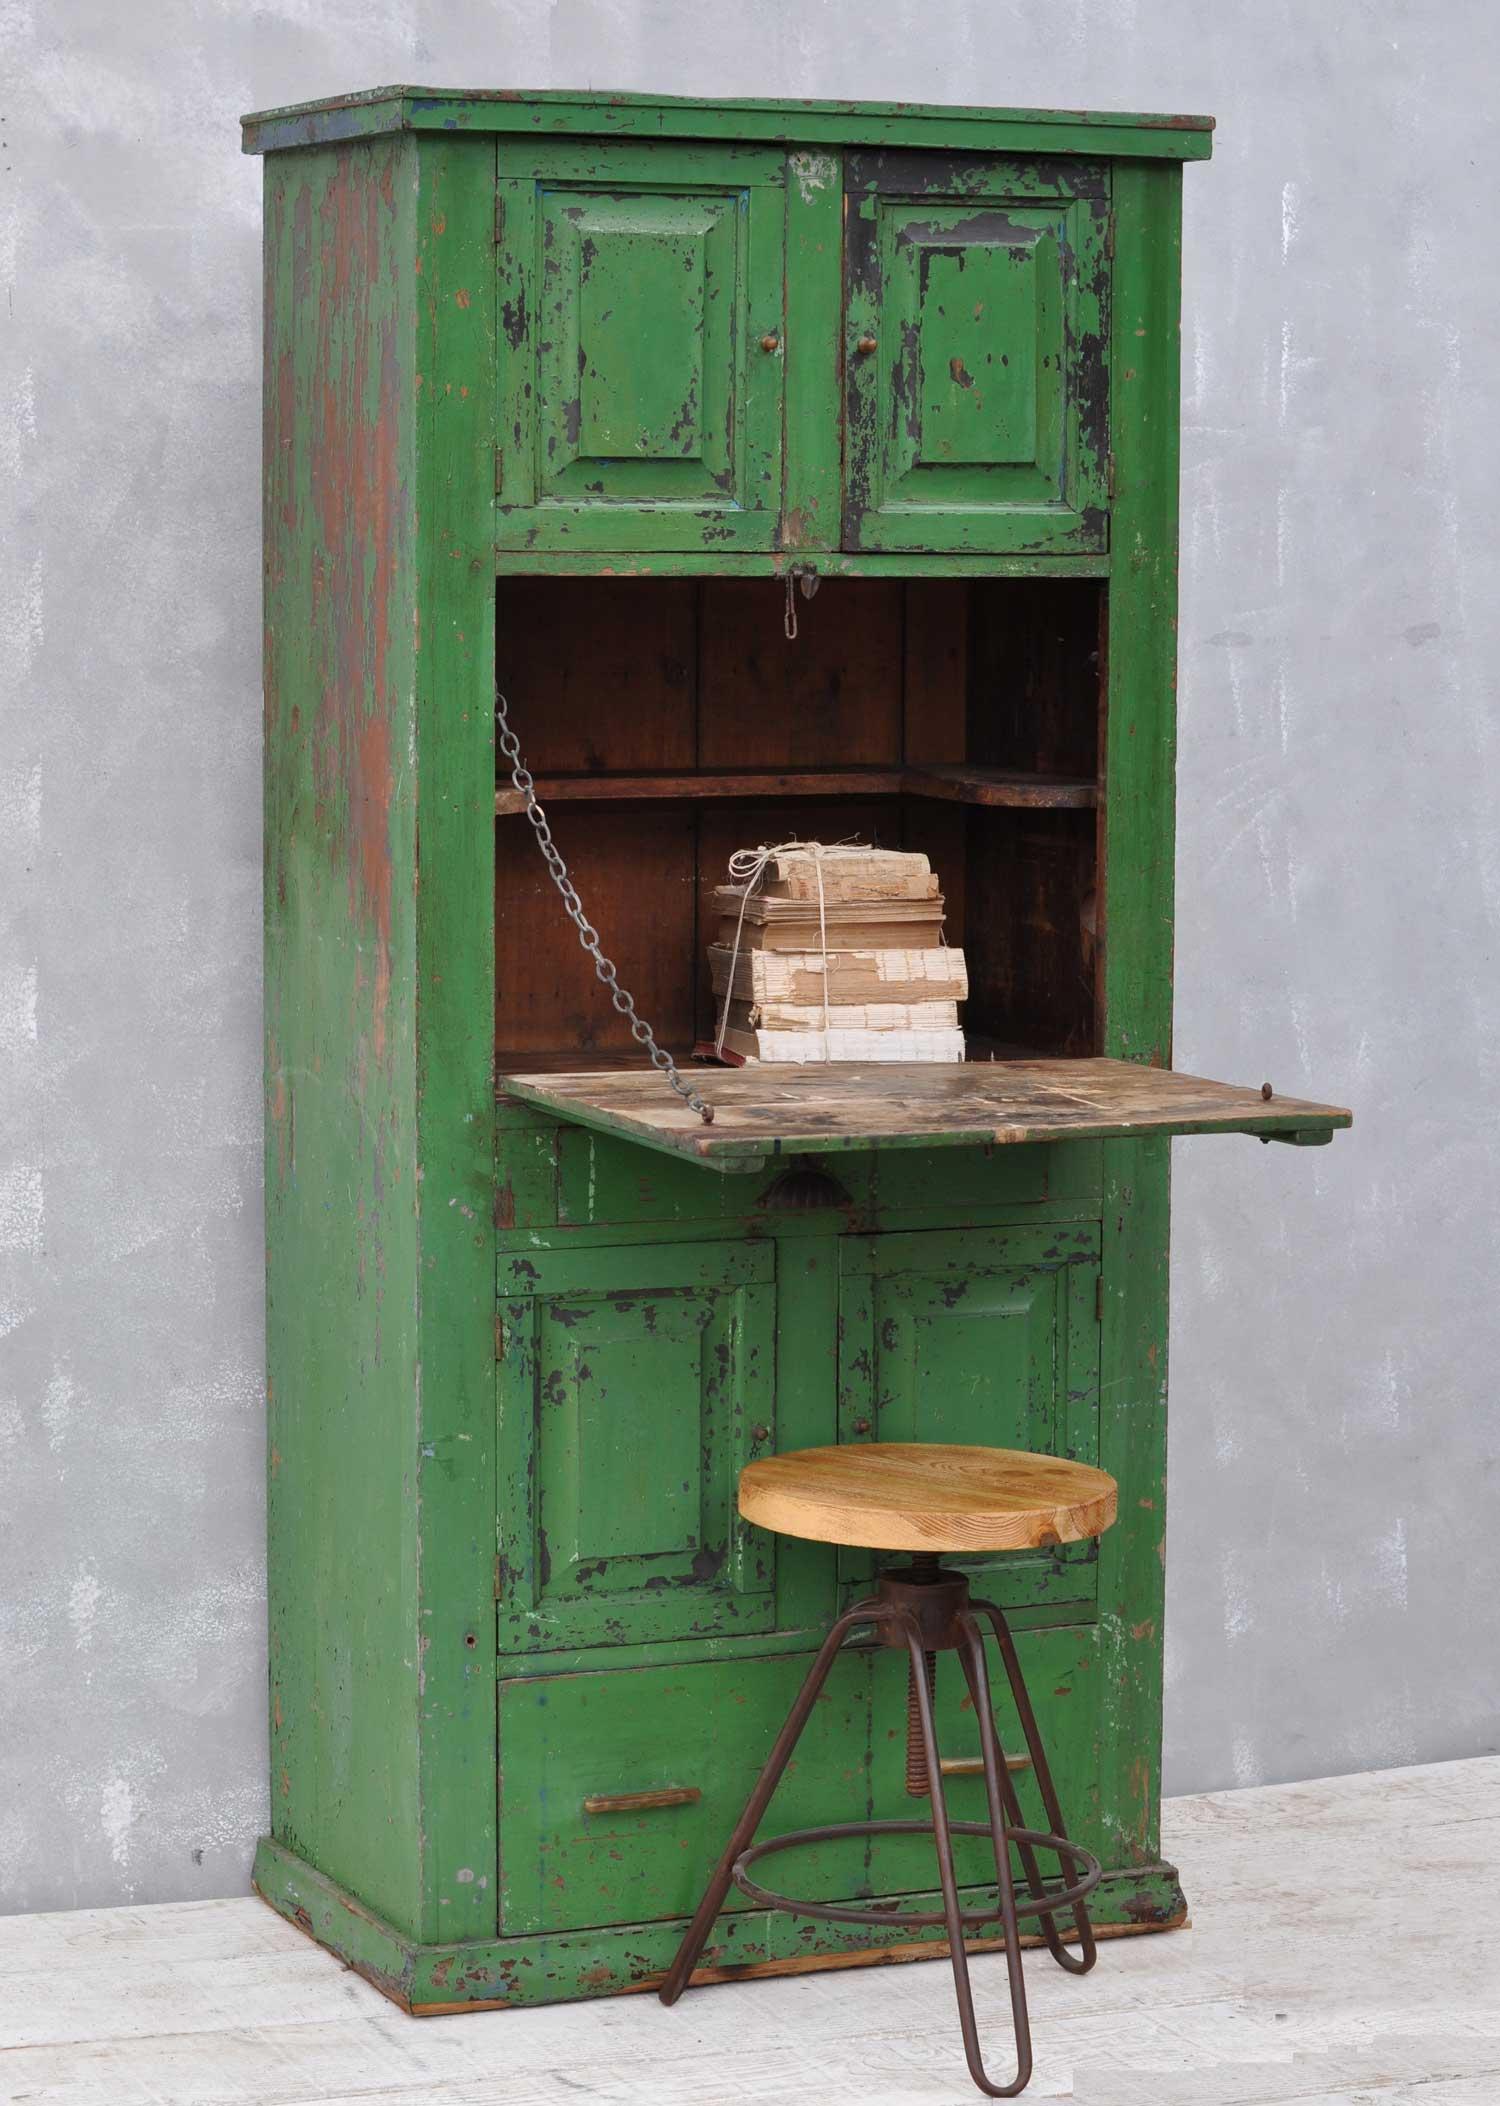 Beau Rustic Vintage Bureau Tall Cabinet Original Green Paintwork